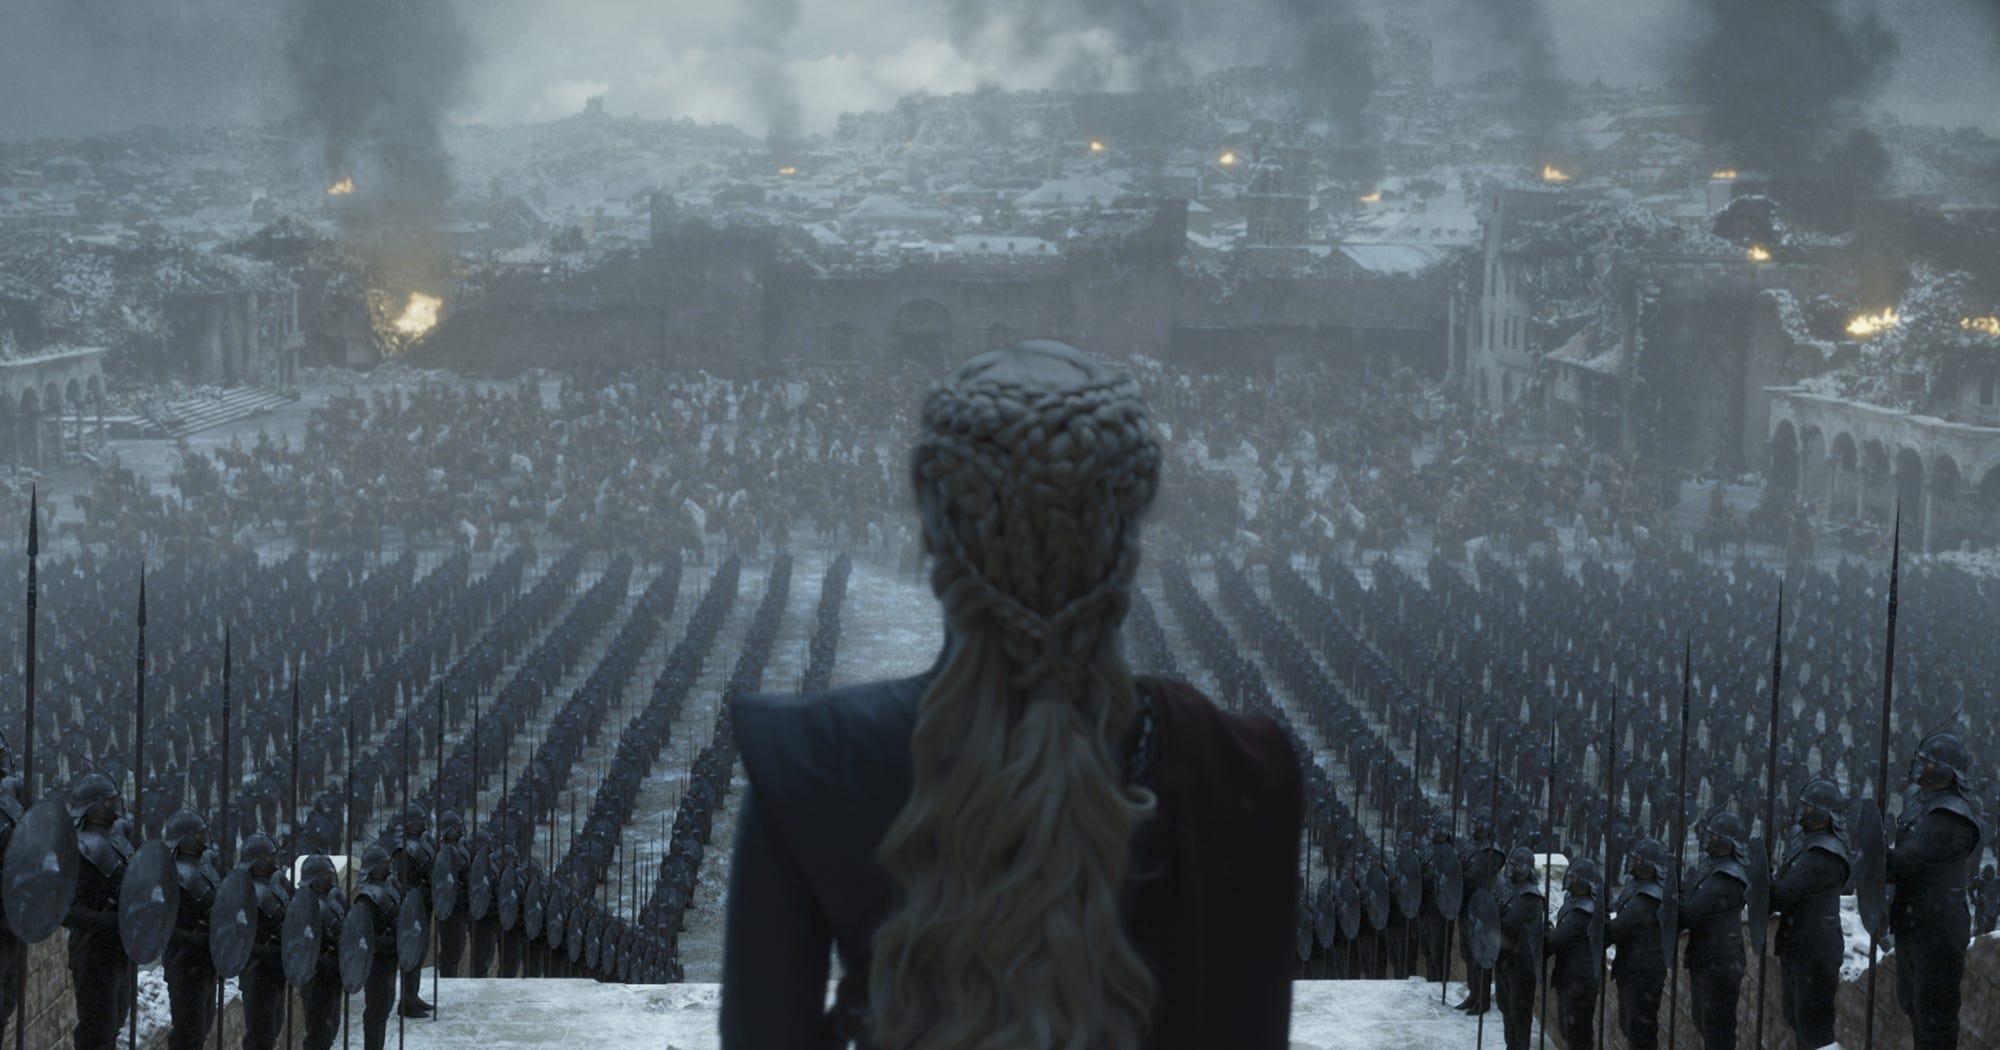 Game Of Thrones Finale Ending Spoilers Are On Reddit